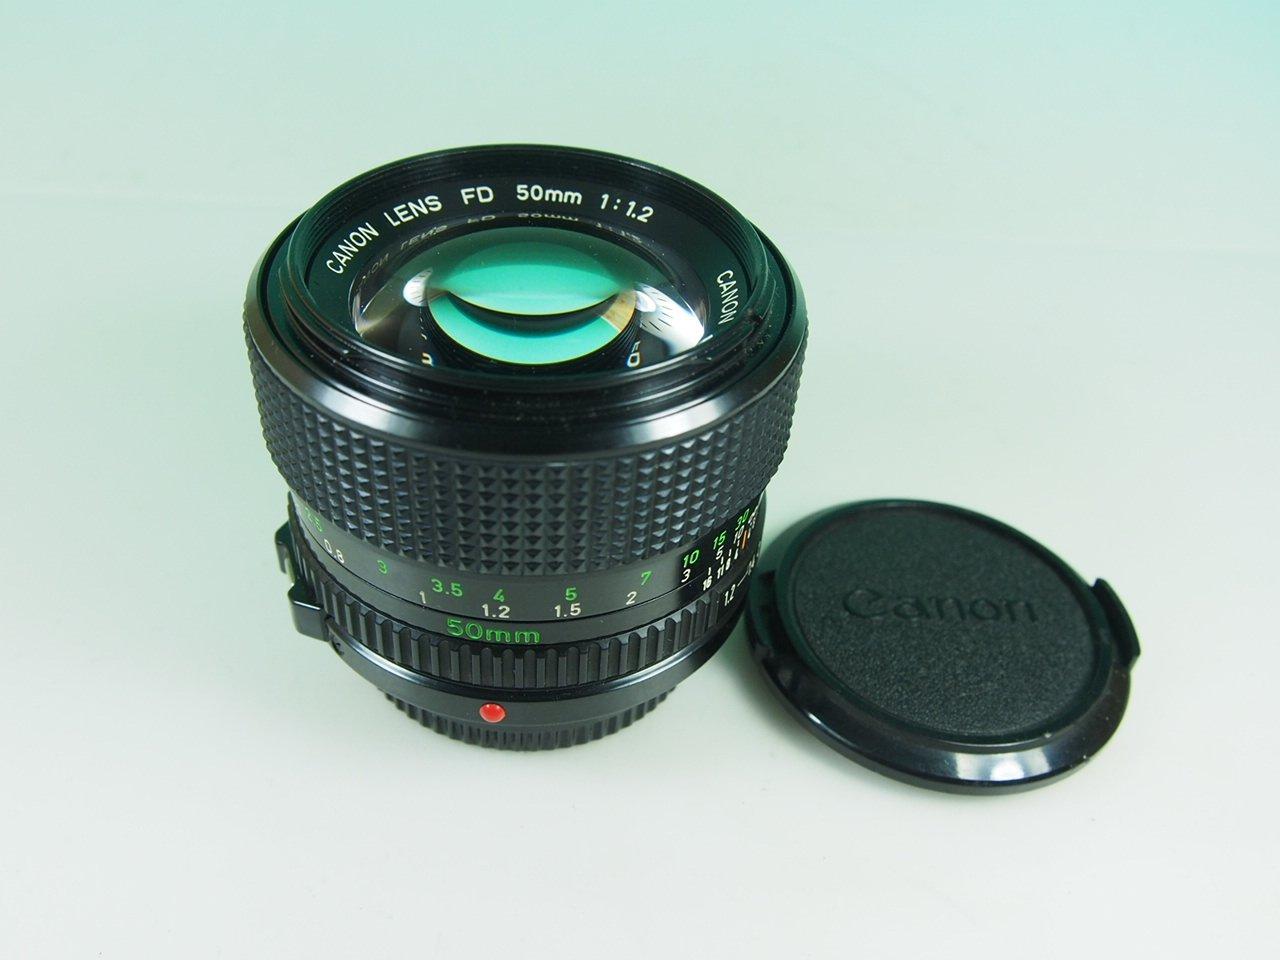 Canon MFレンズ FD Canon 55mm 55mm F1.2 B00MA8ZYWE B00MA8ZYWE, 暮らしの百貨店:9dcb6042 --- integralved.hu